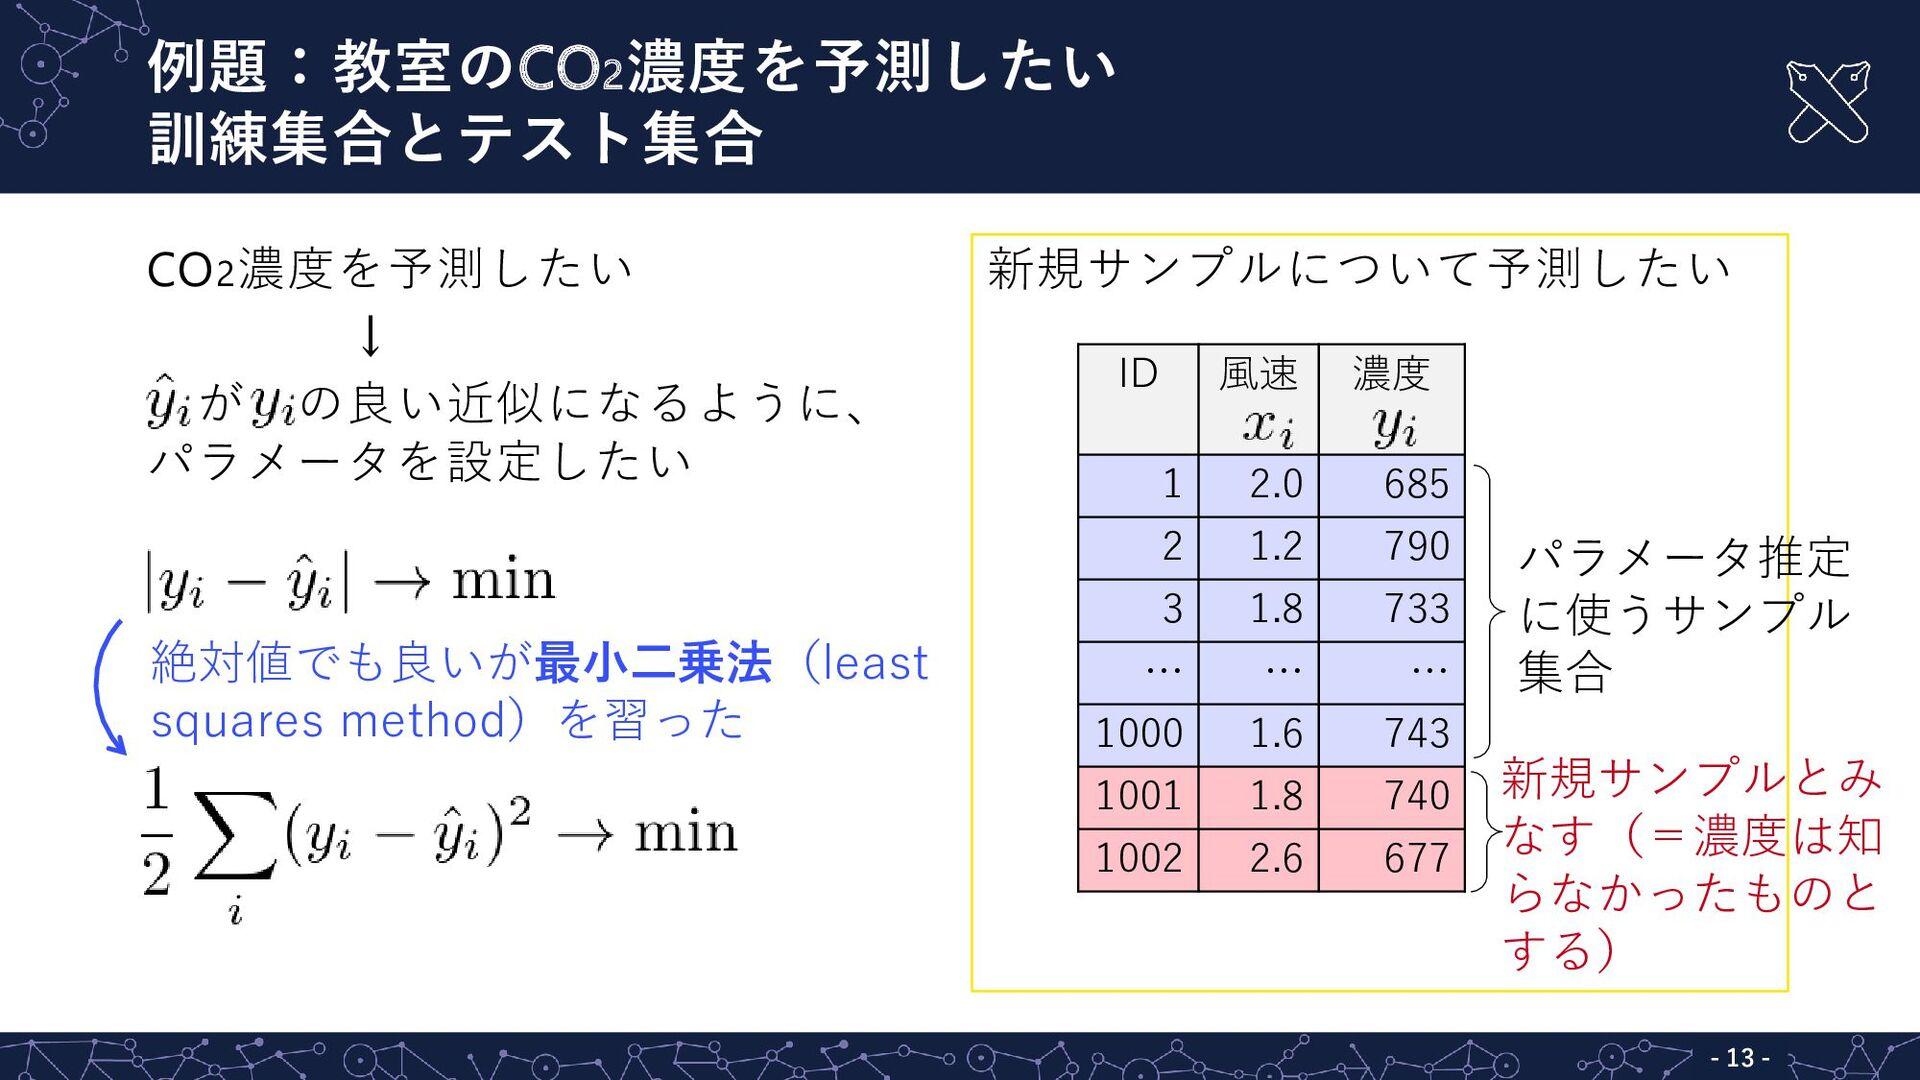 CO2濃度を予測したい ↓ が の良い近似になるように、 パラメータを設定したい 新規サンプル...